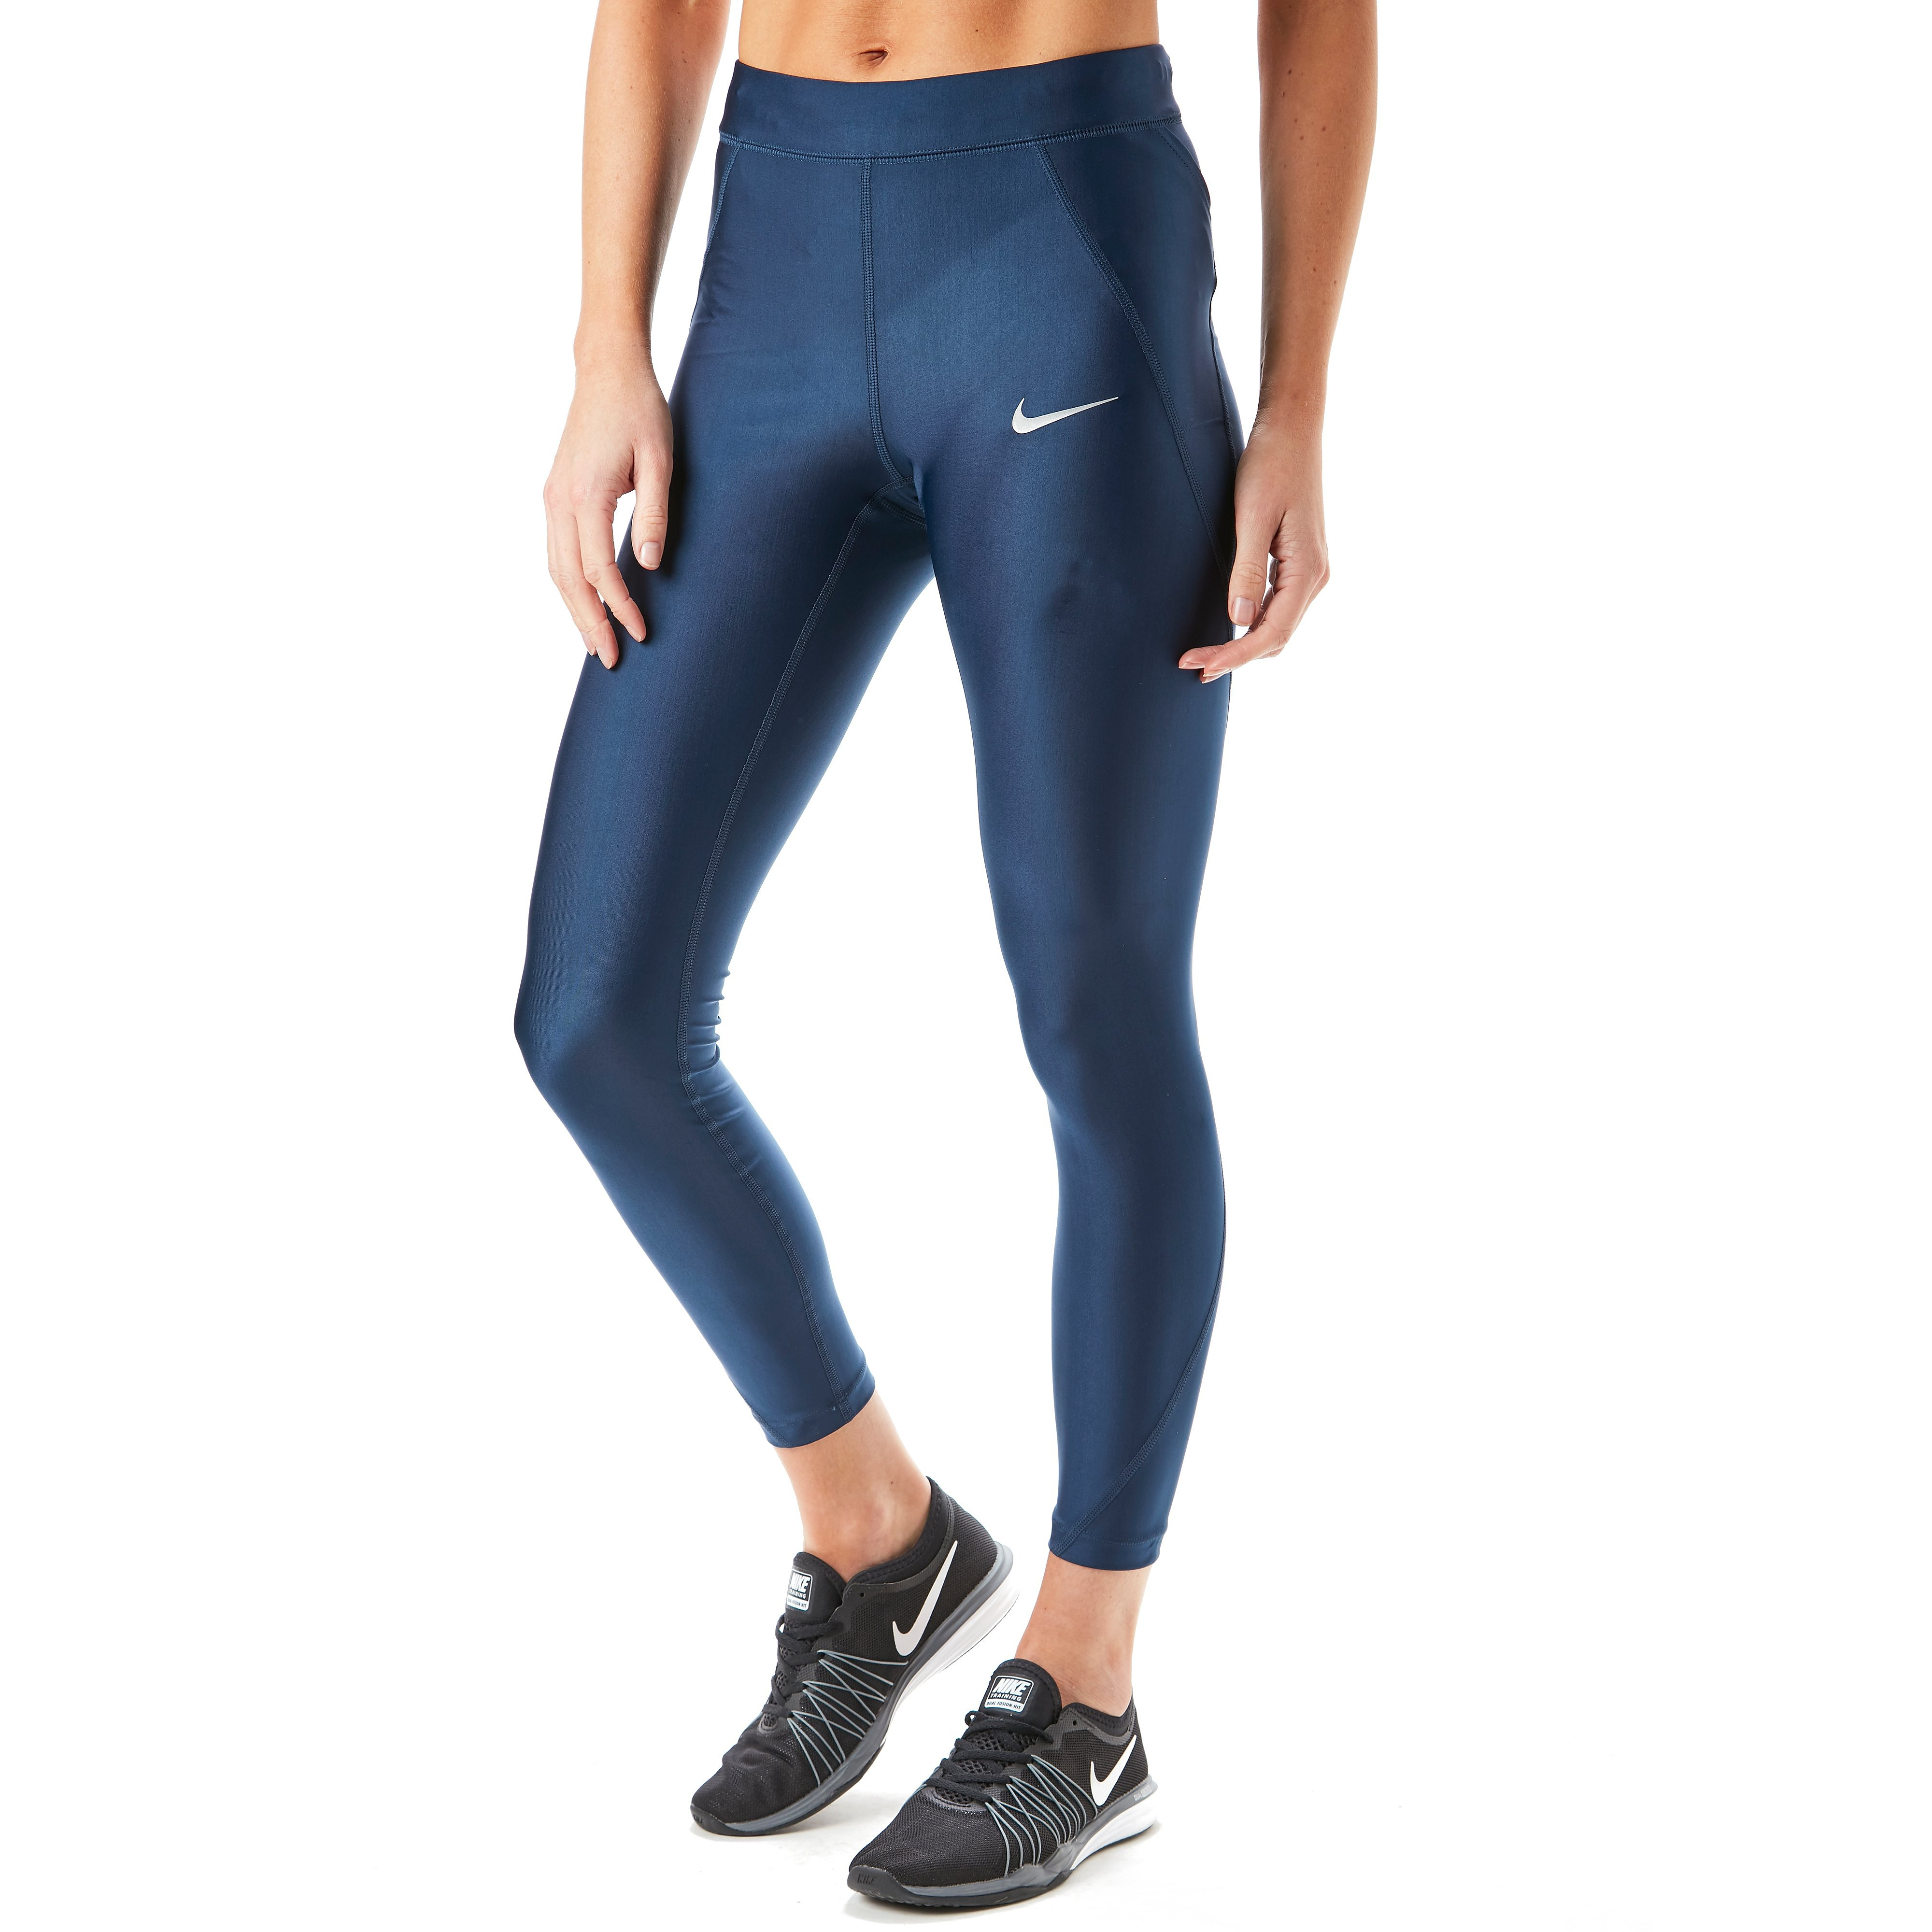 Nike Speed 7/8 Women's Running Tights